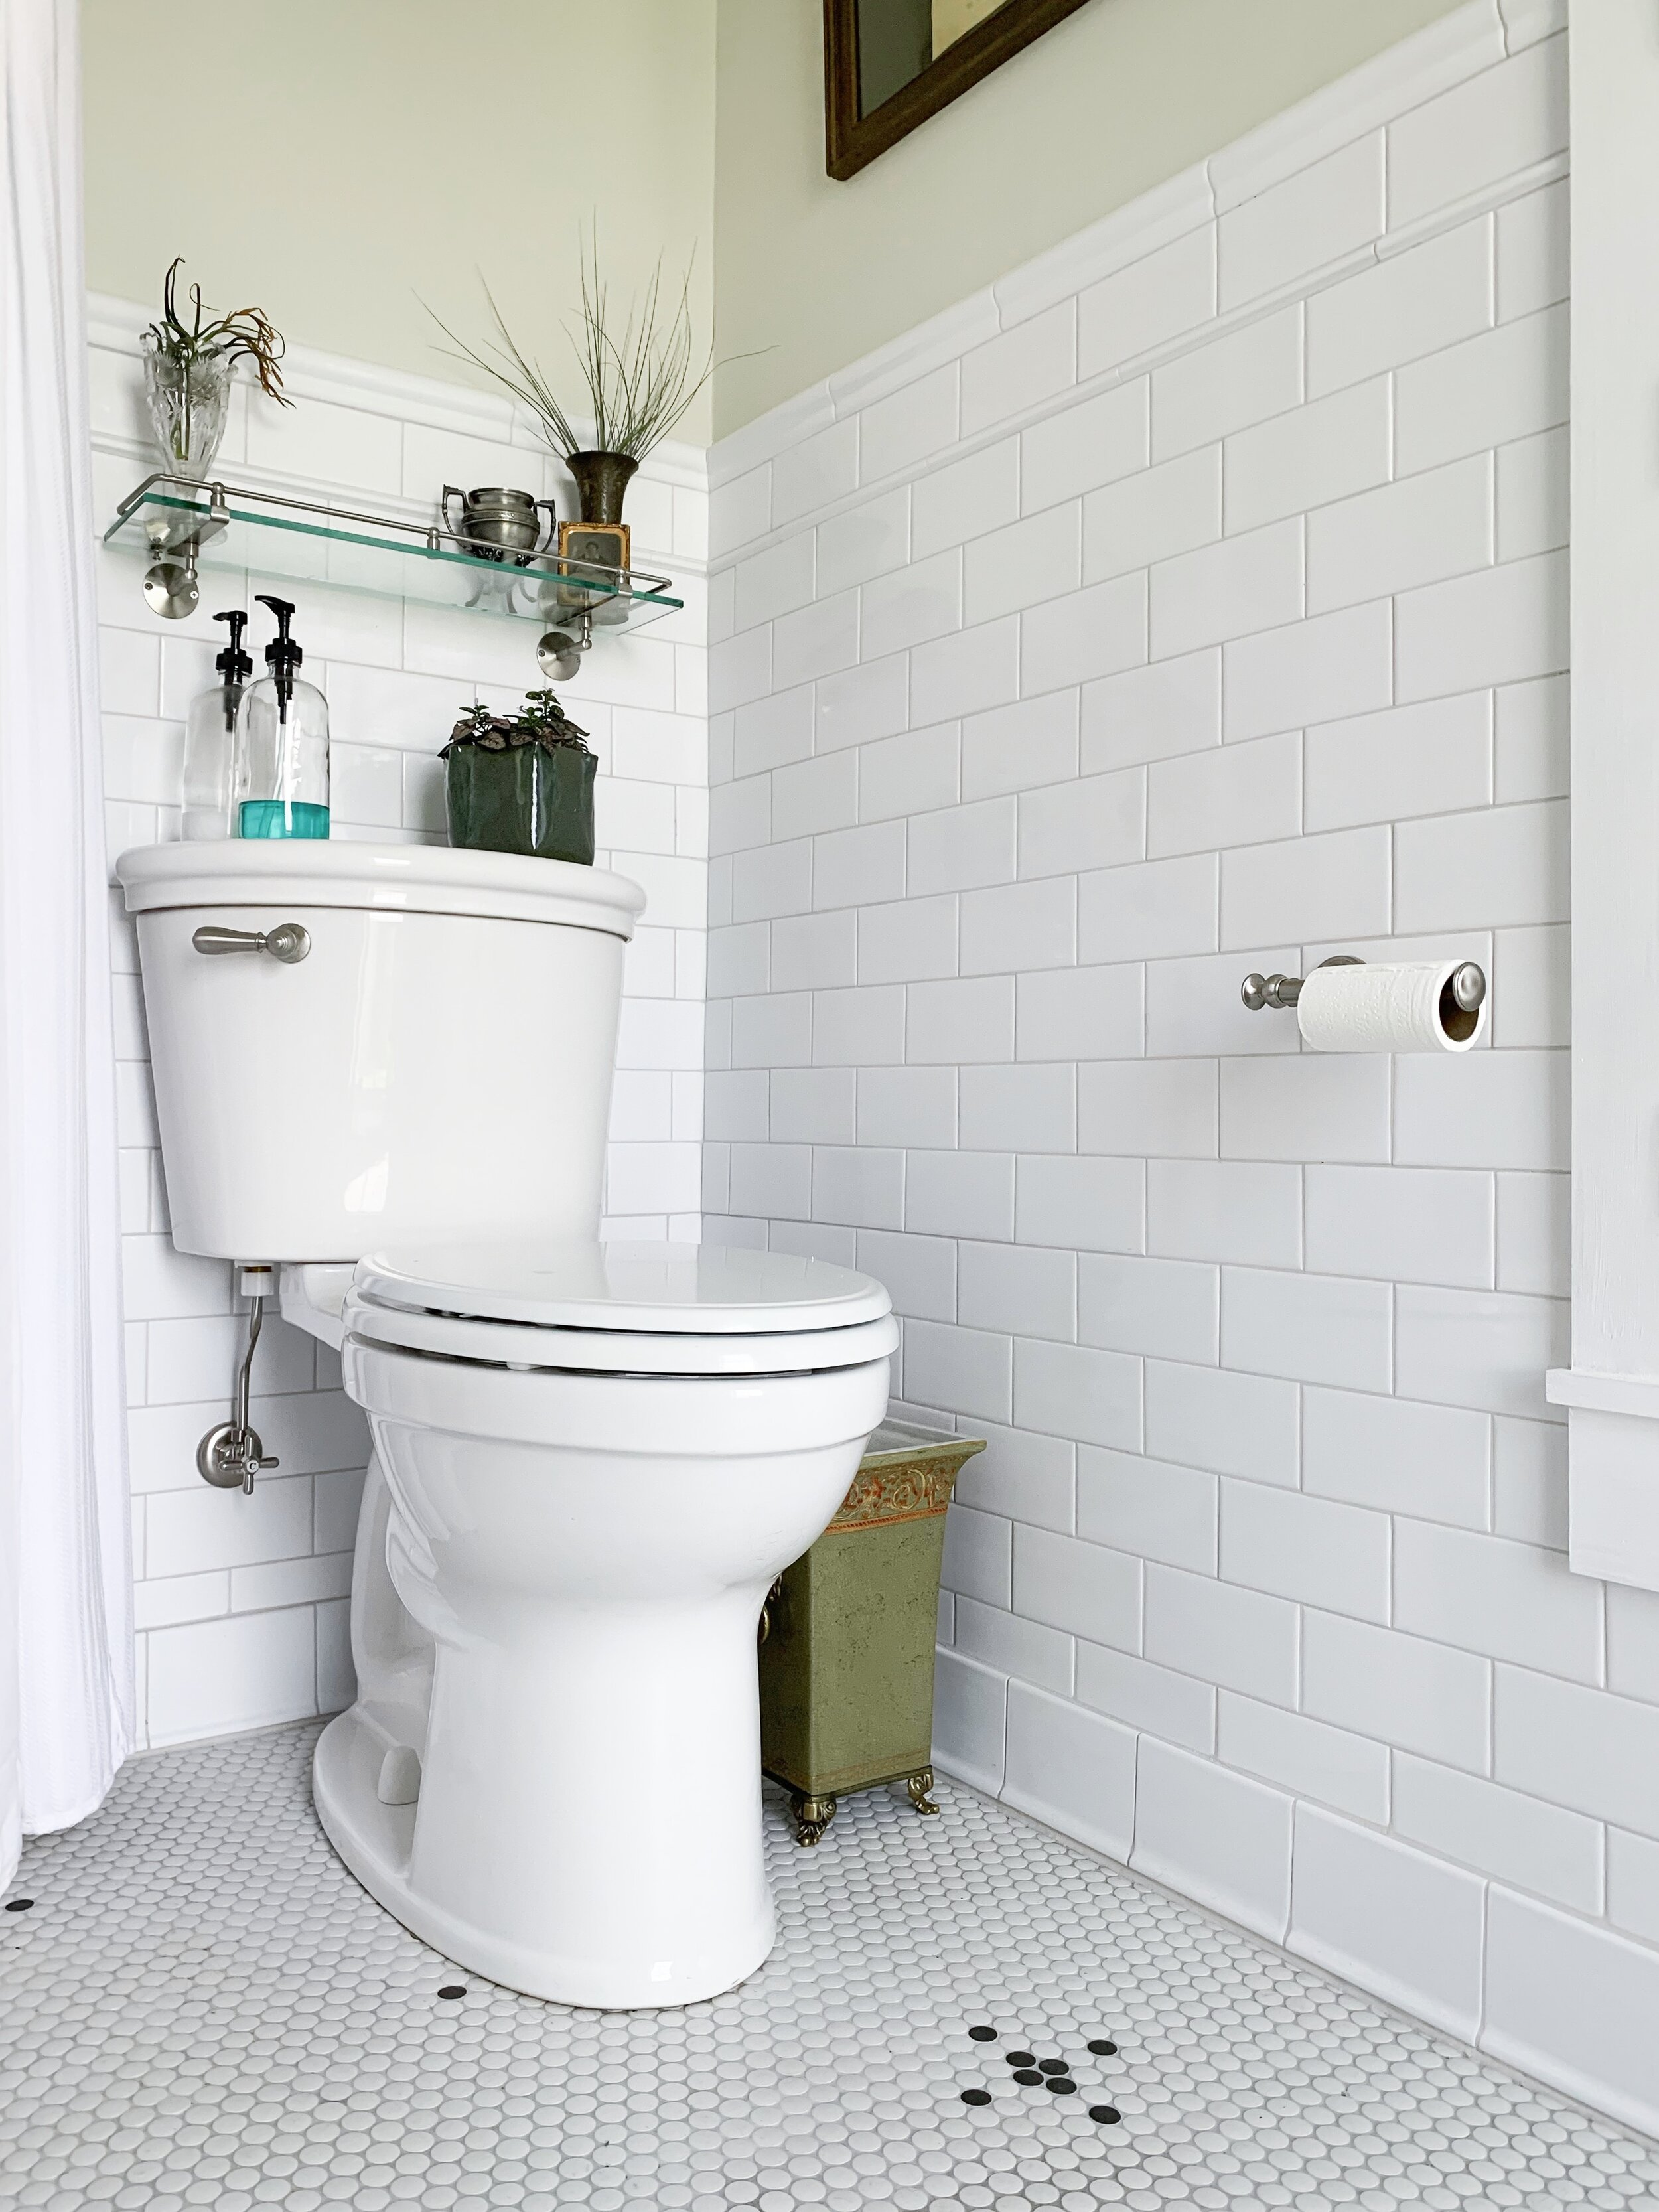 Toilet  |  Toilet Seat  |  Handle  |  Water Shut Off  |  Toilet Paper Holder